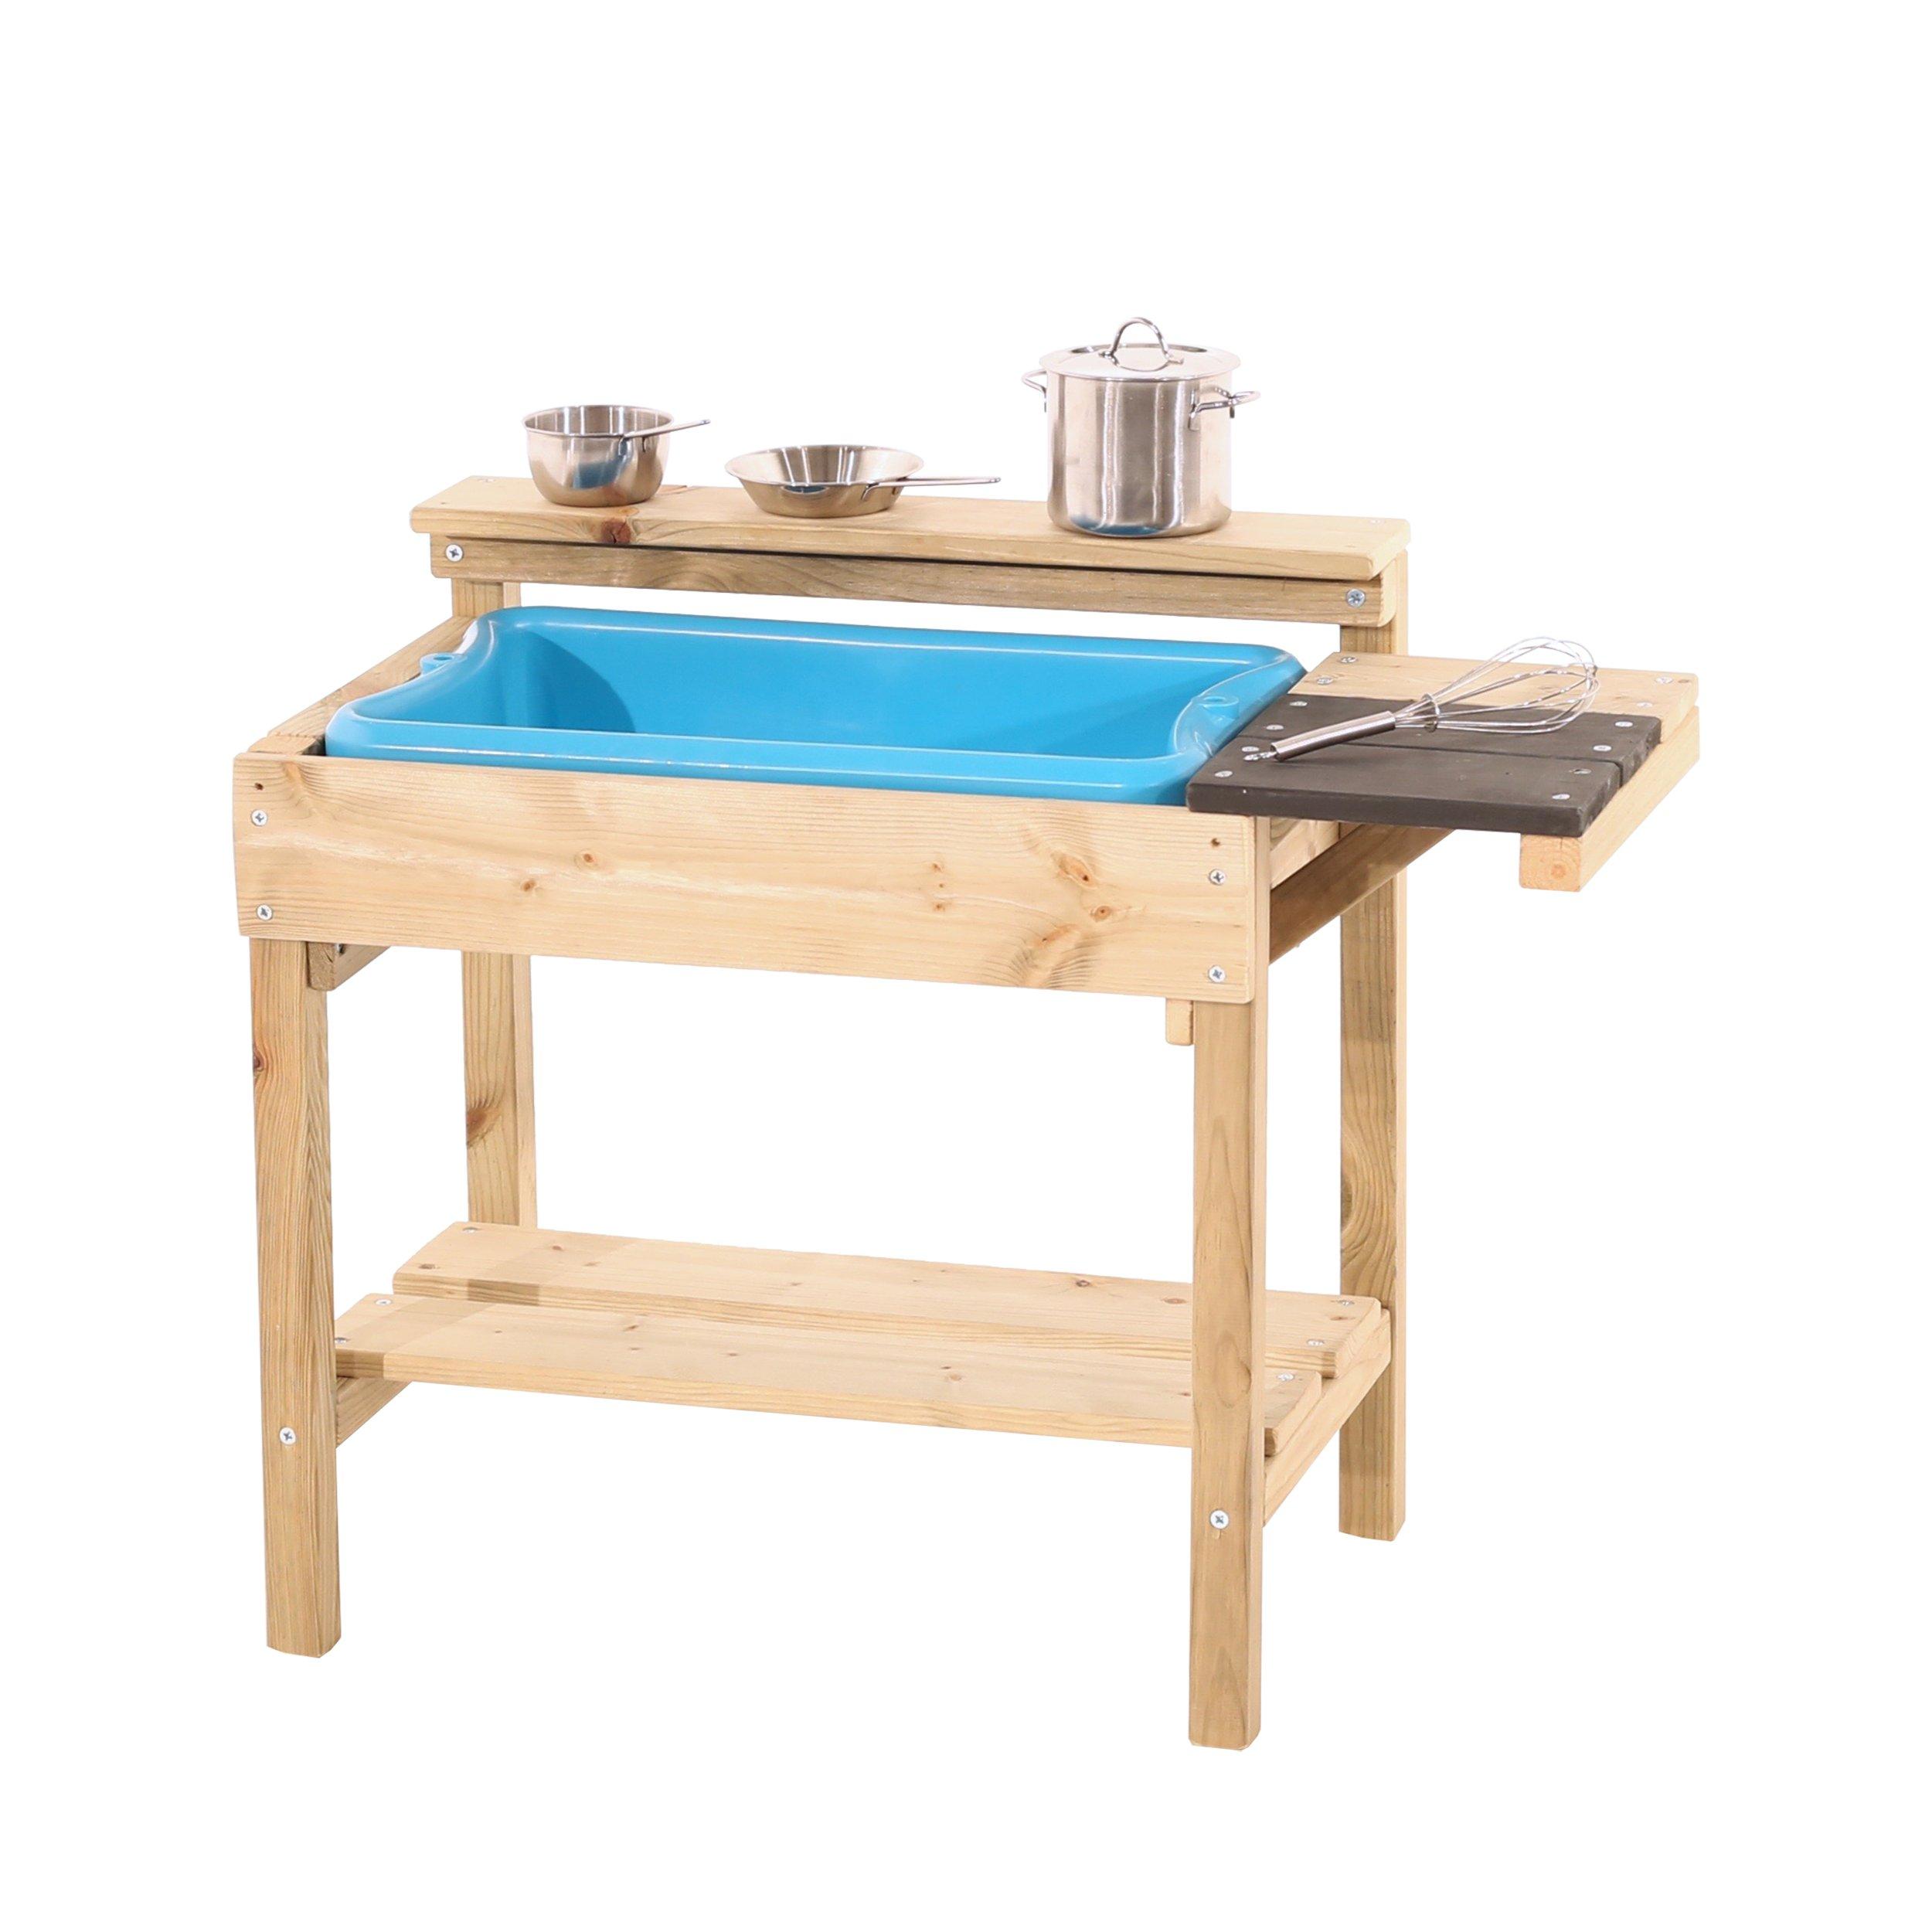 Teamson Kids TDF-00005 Little Chef Mud Outdoor Play Kitchen-Aqua//Wood